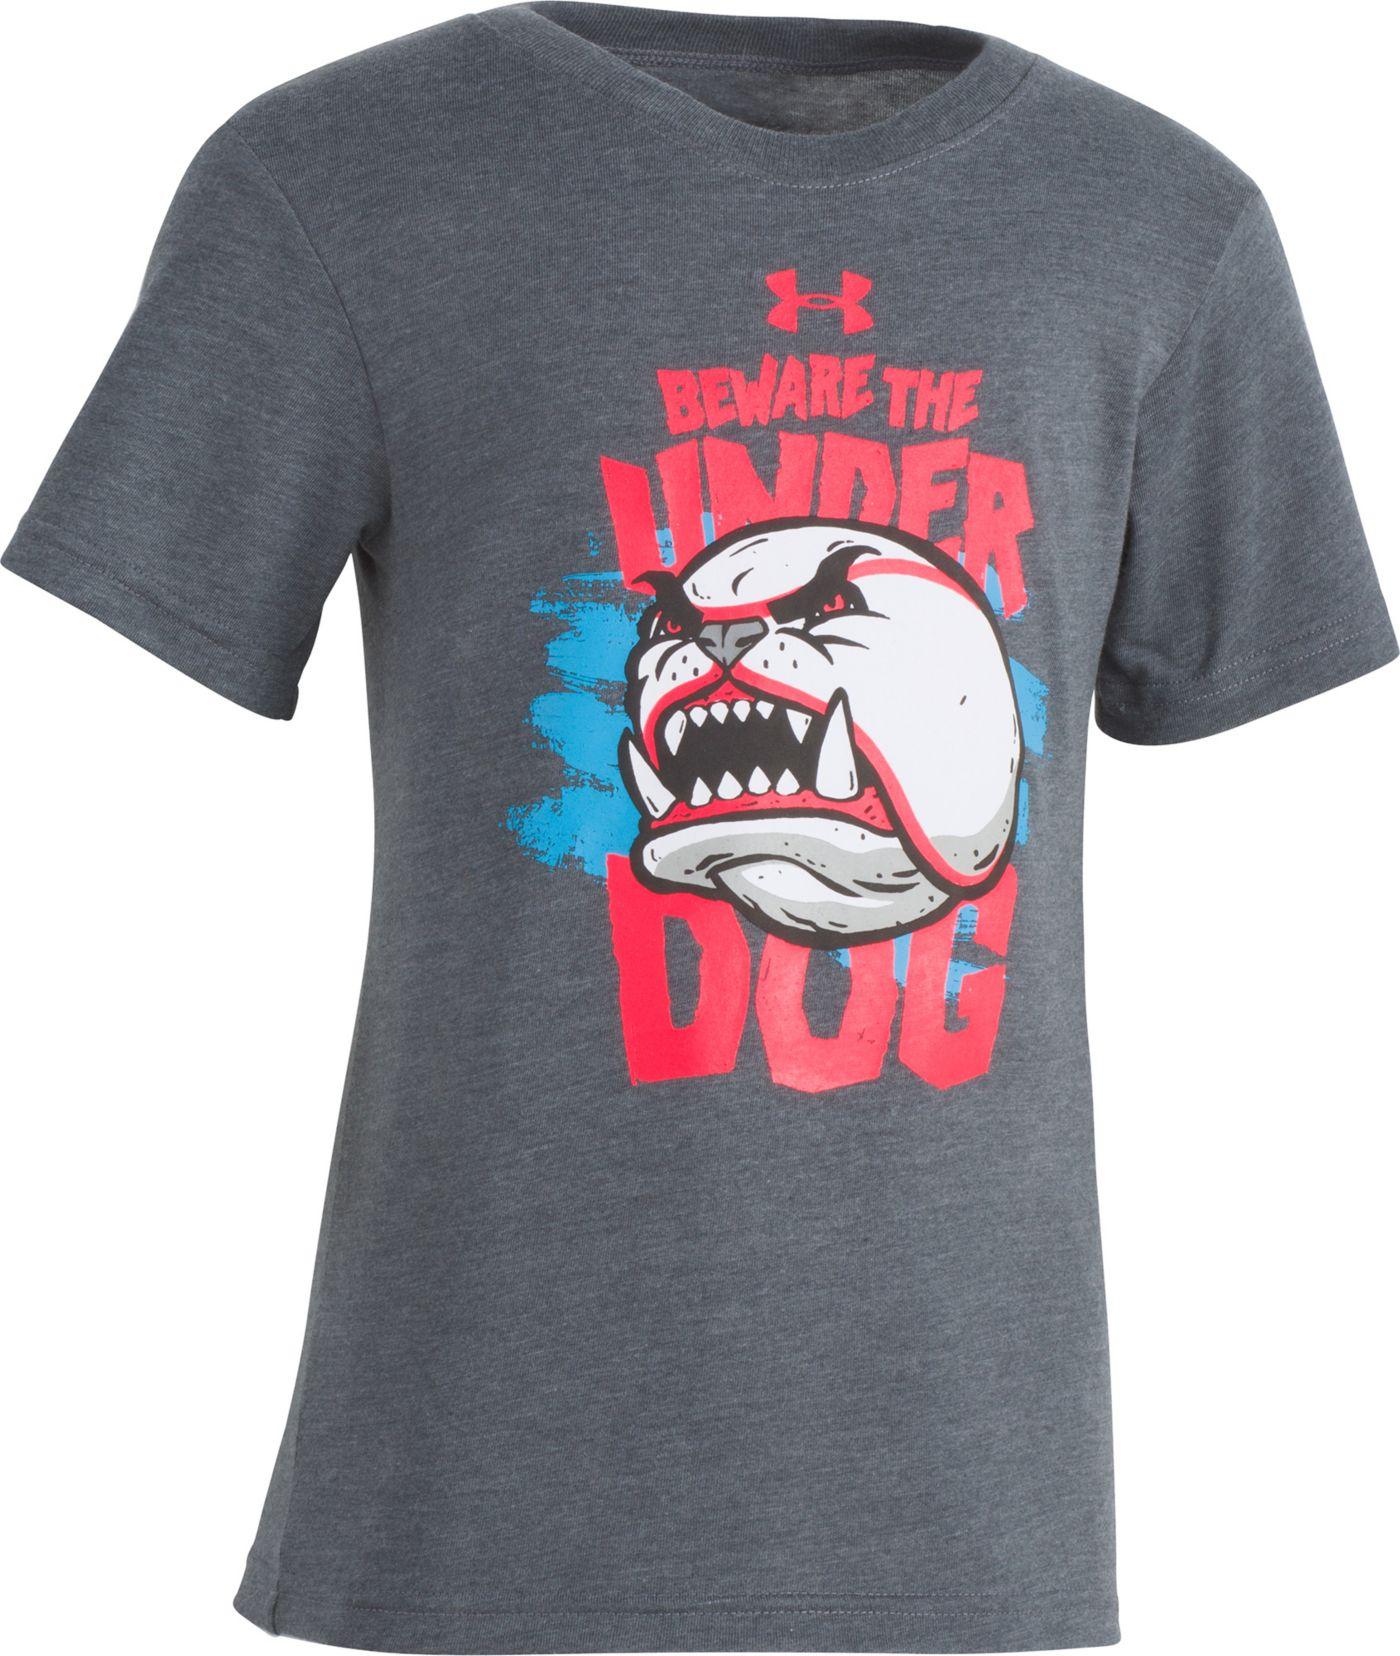 Under Armour Little Boys' Beware The Underdog Graphic T-Shirt